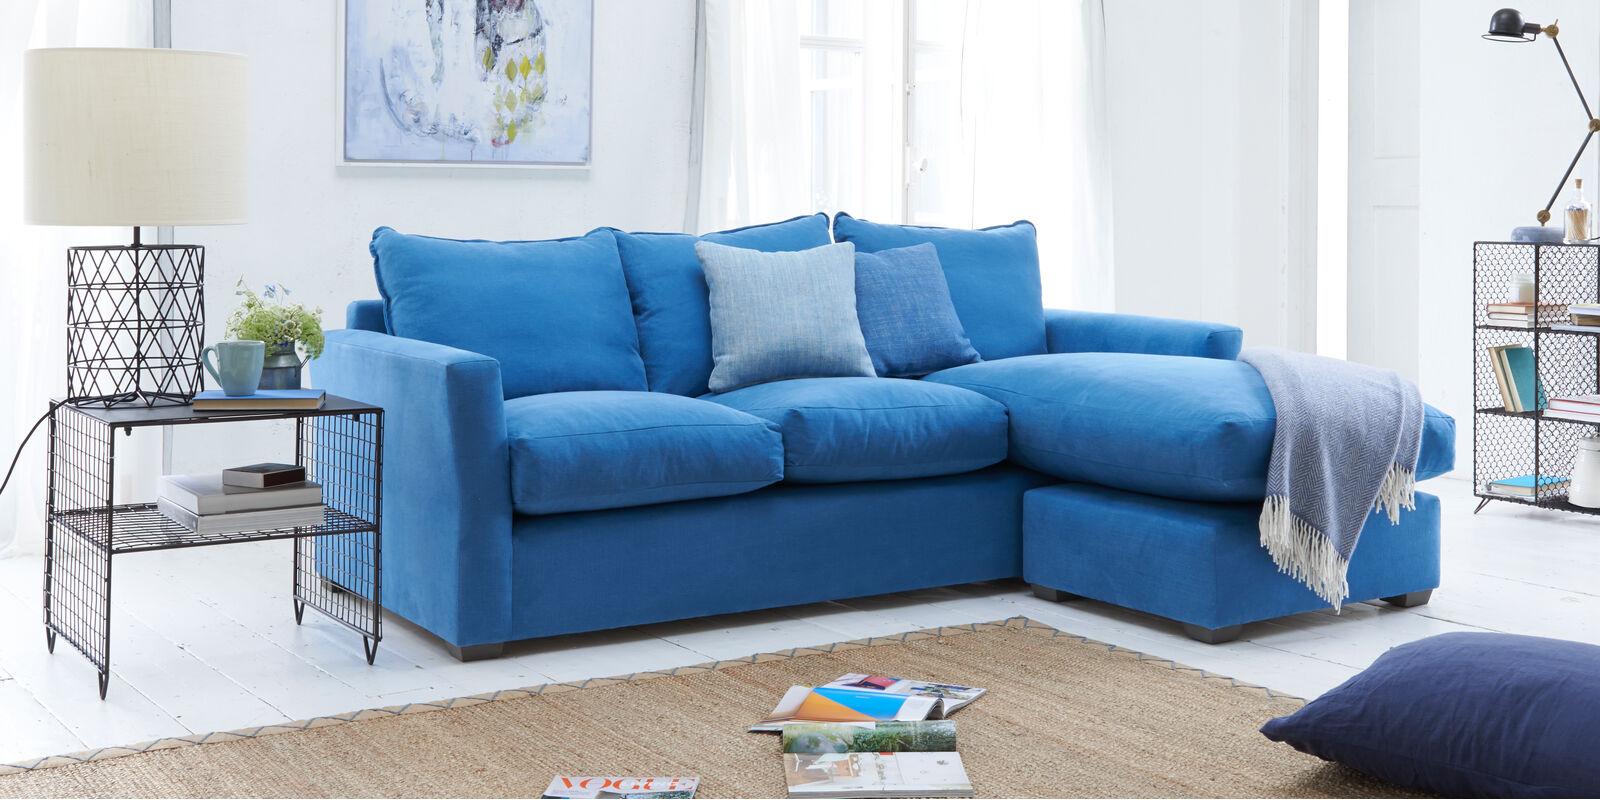 Gorgeous British made contemporary pavilion chaise corner sofa